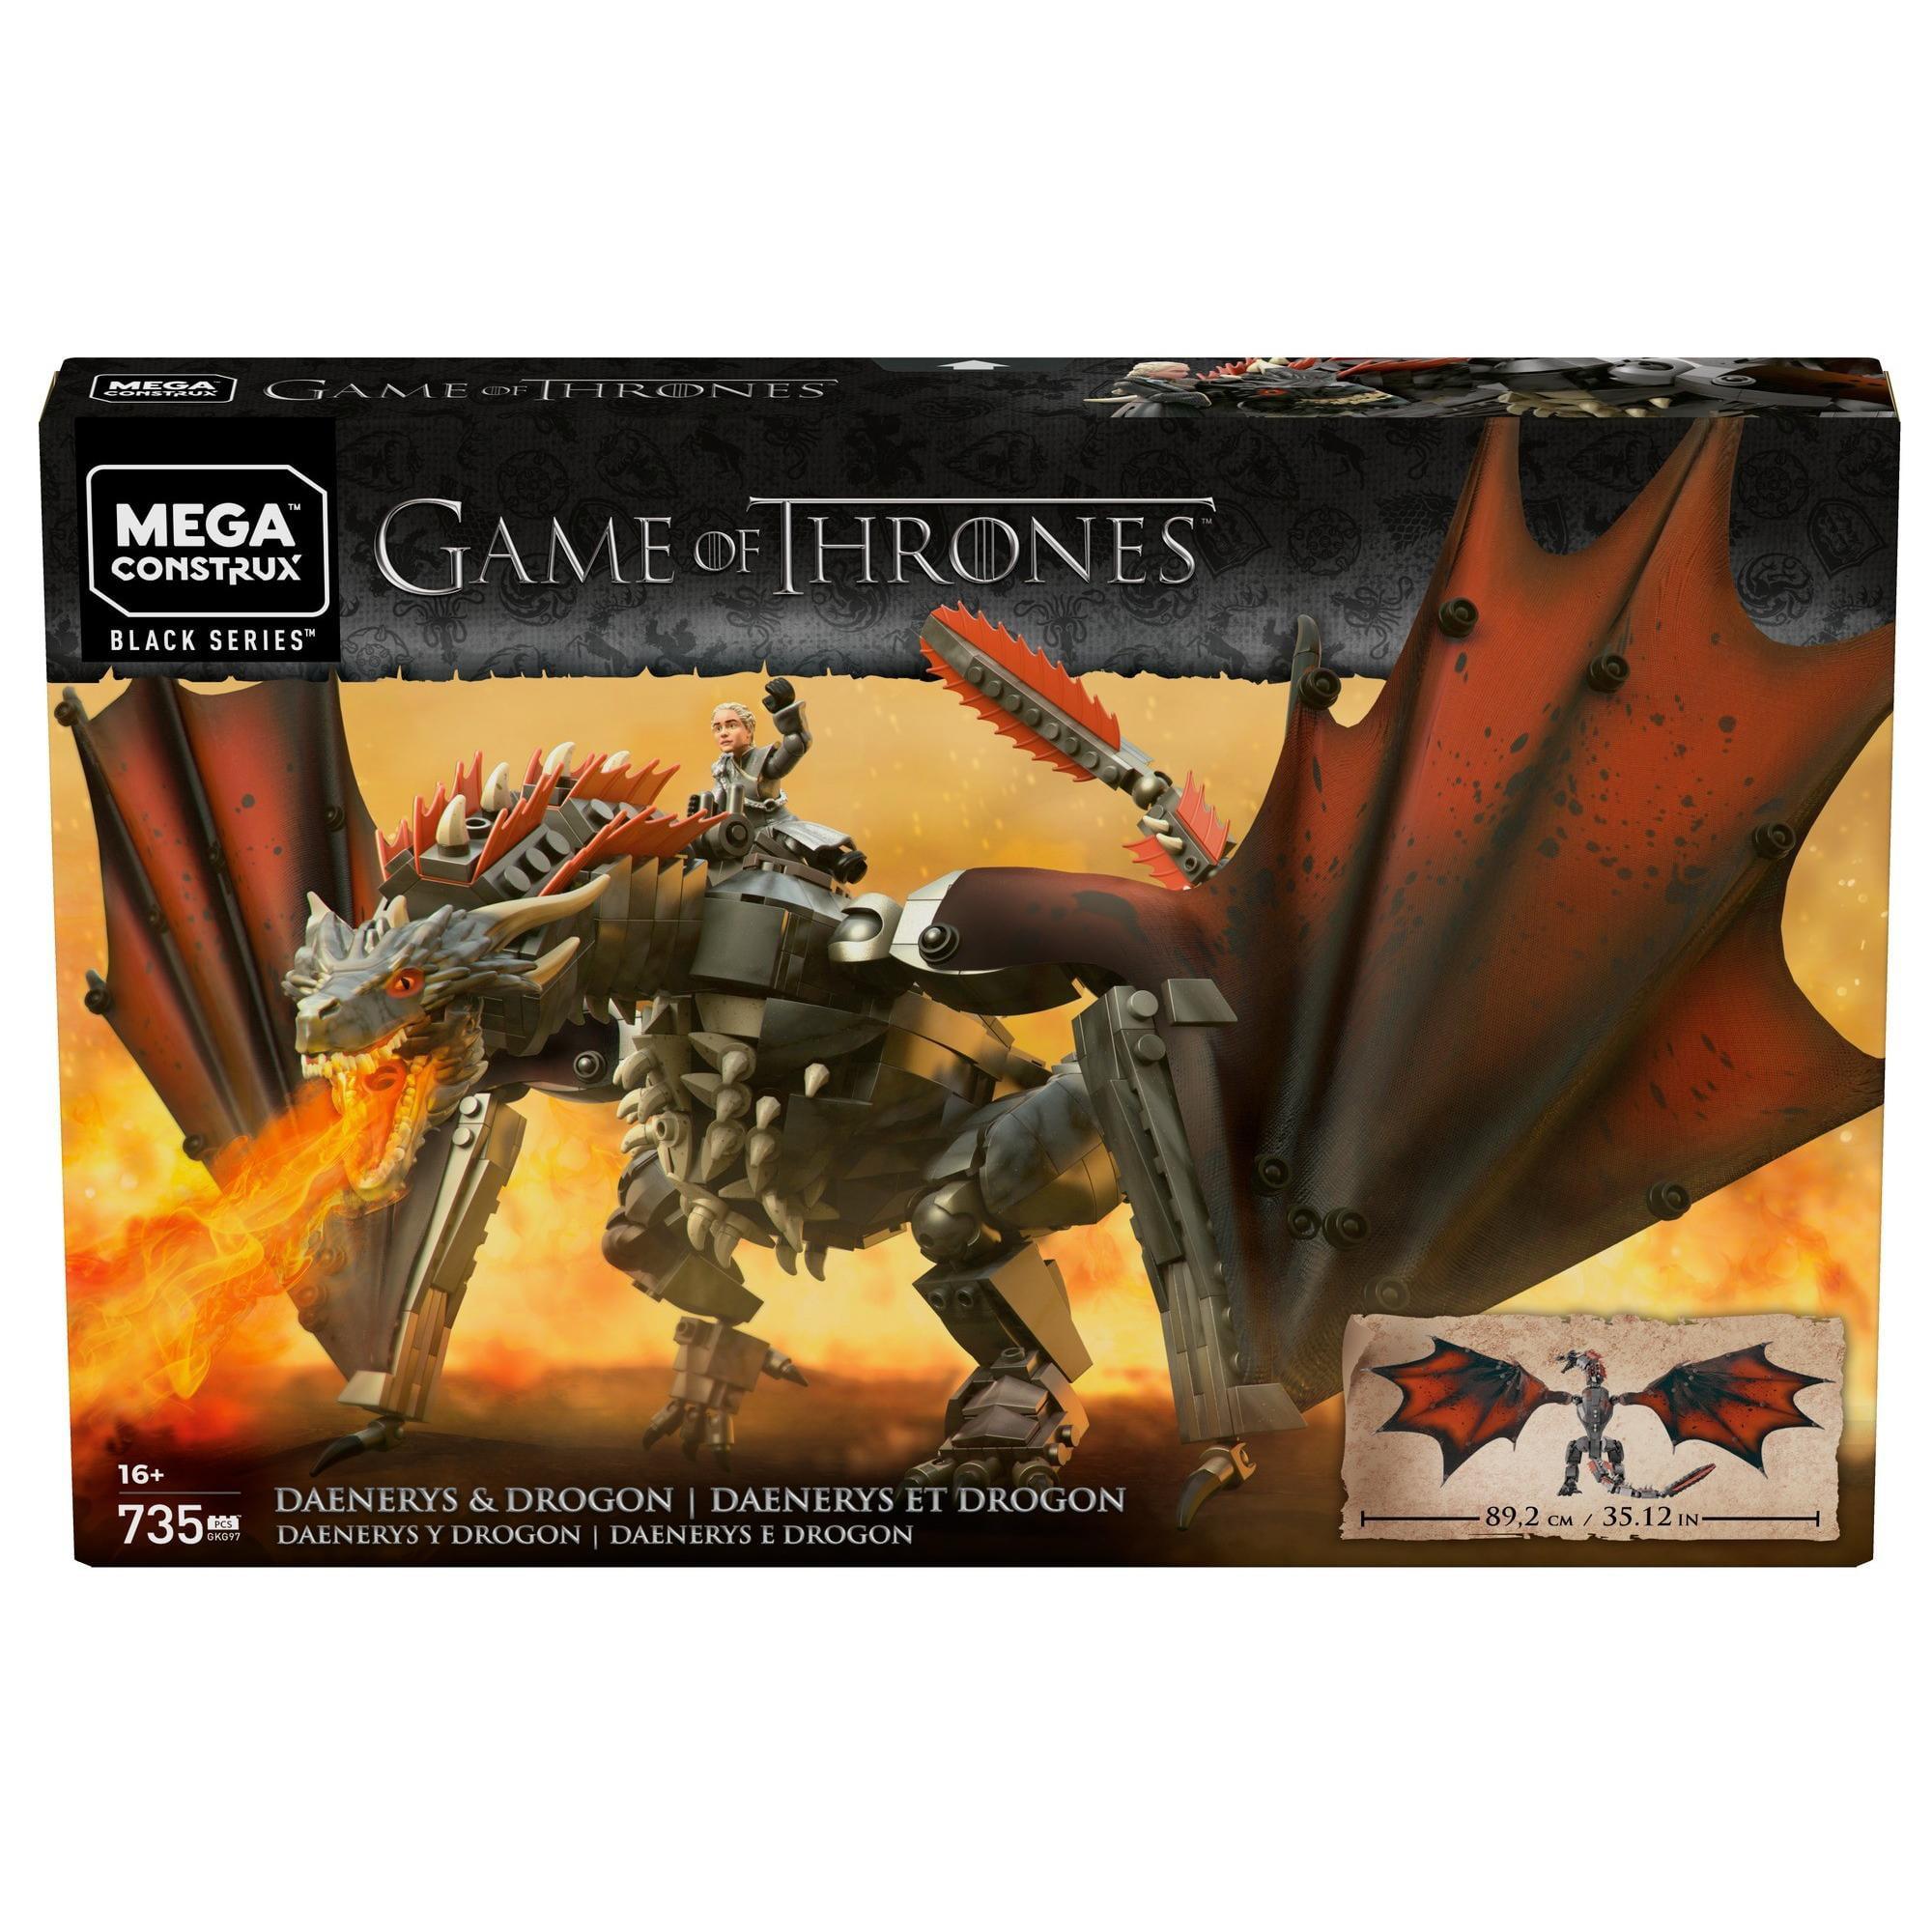 Mega Construx Game of Thrones Daenerys and Drogon